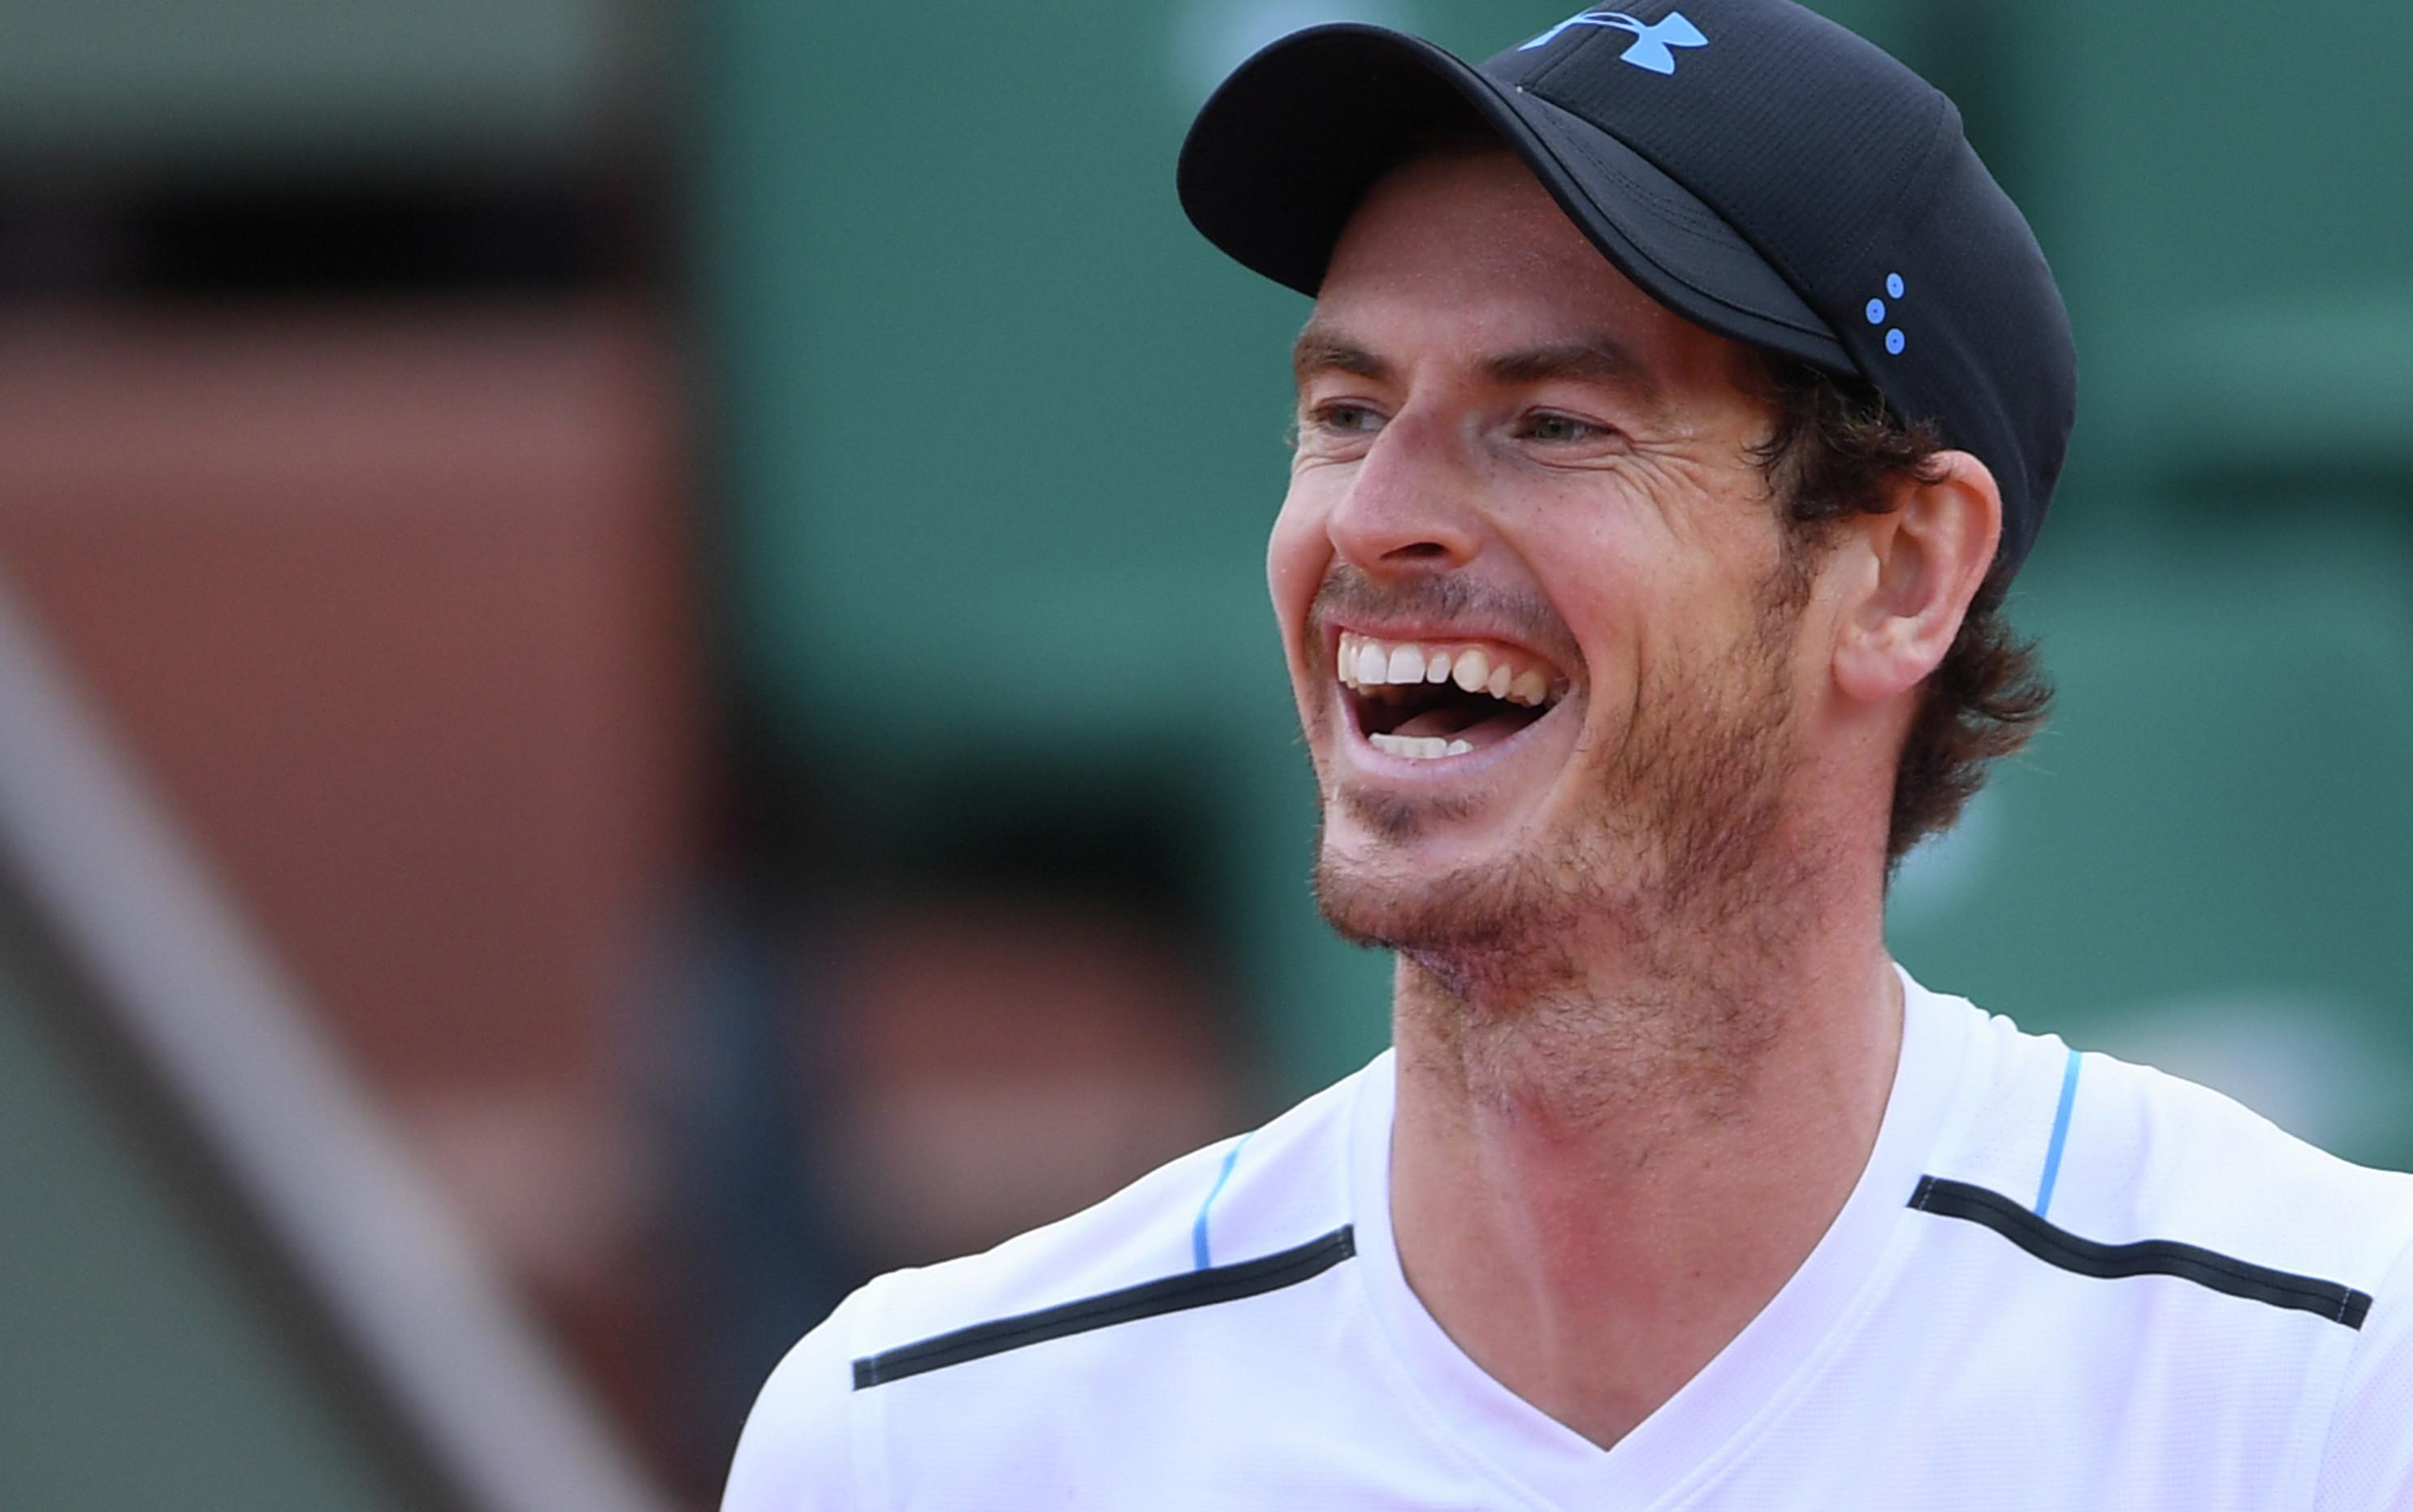 <p>Теннисист Энди Маррей. Фото: &copy; РИА Новости/Алексей Филиппов</p>